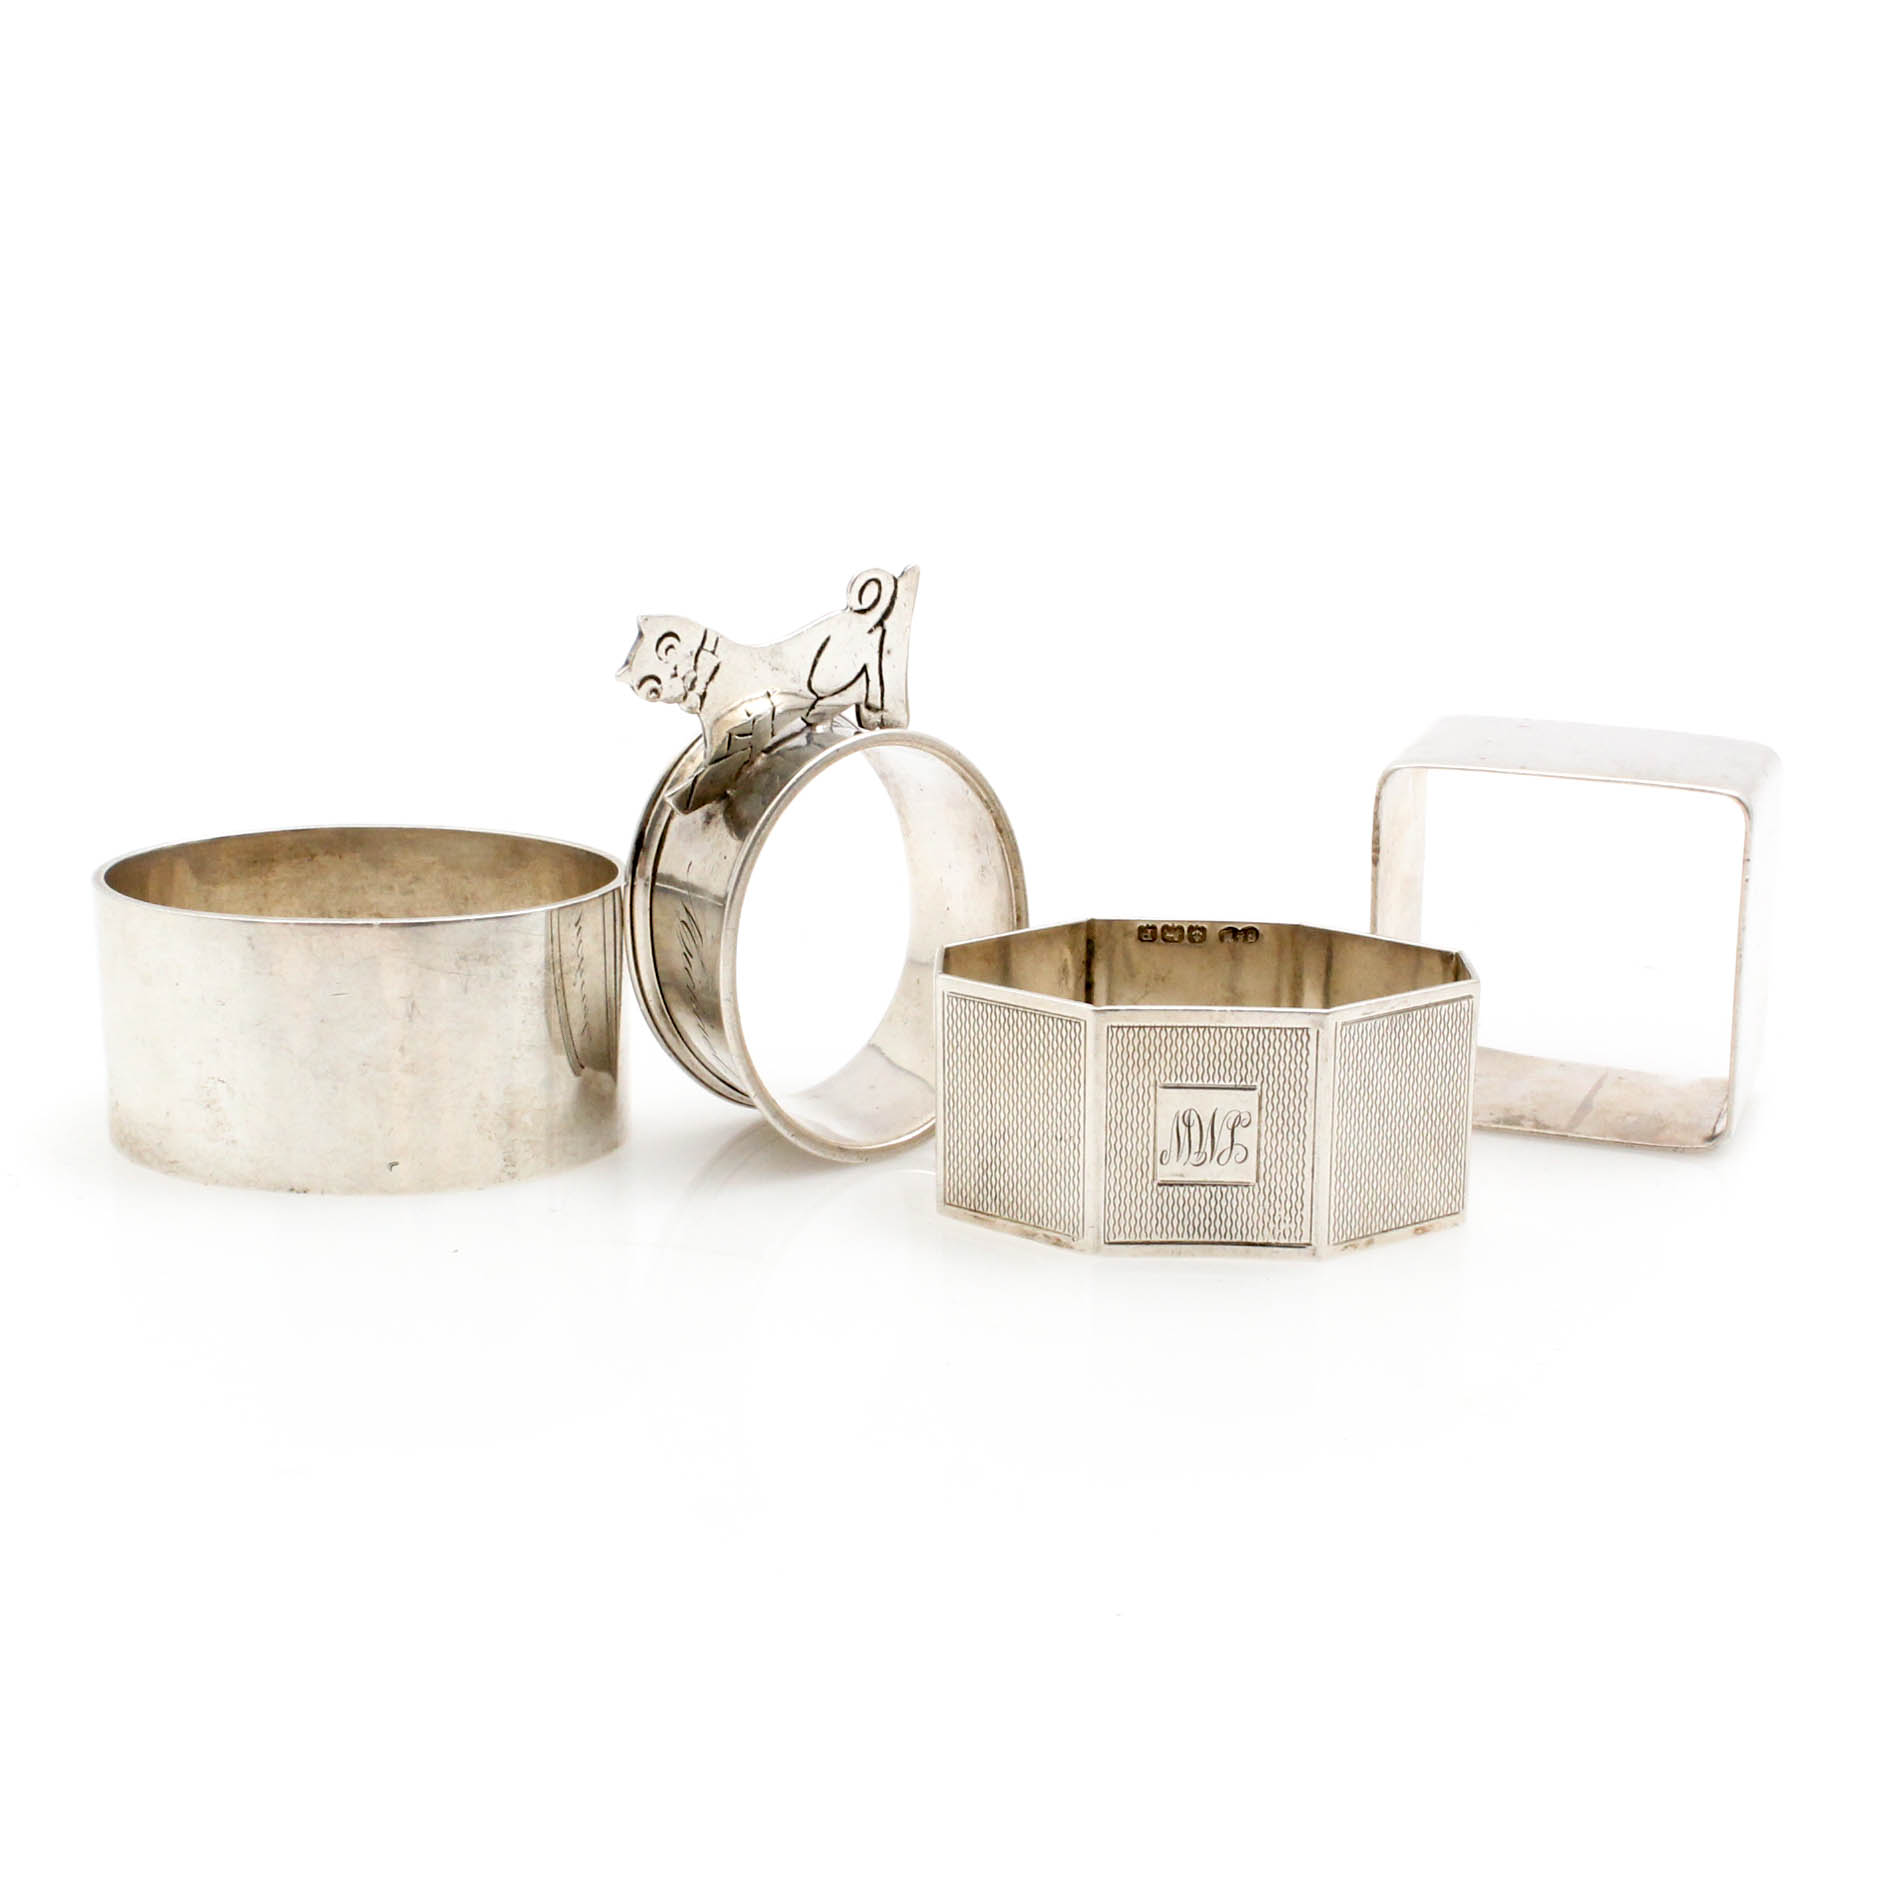 Dating engelsk Sterling sølv